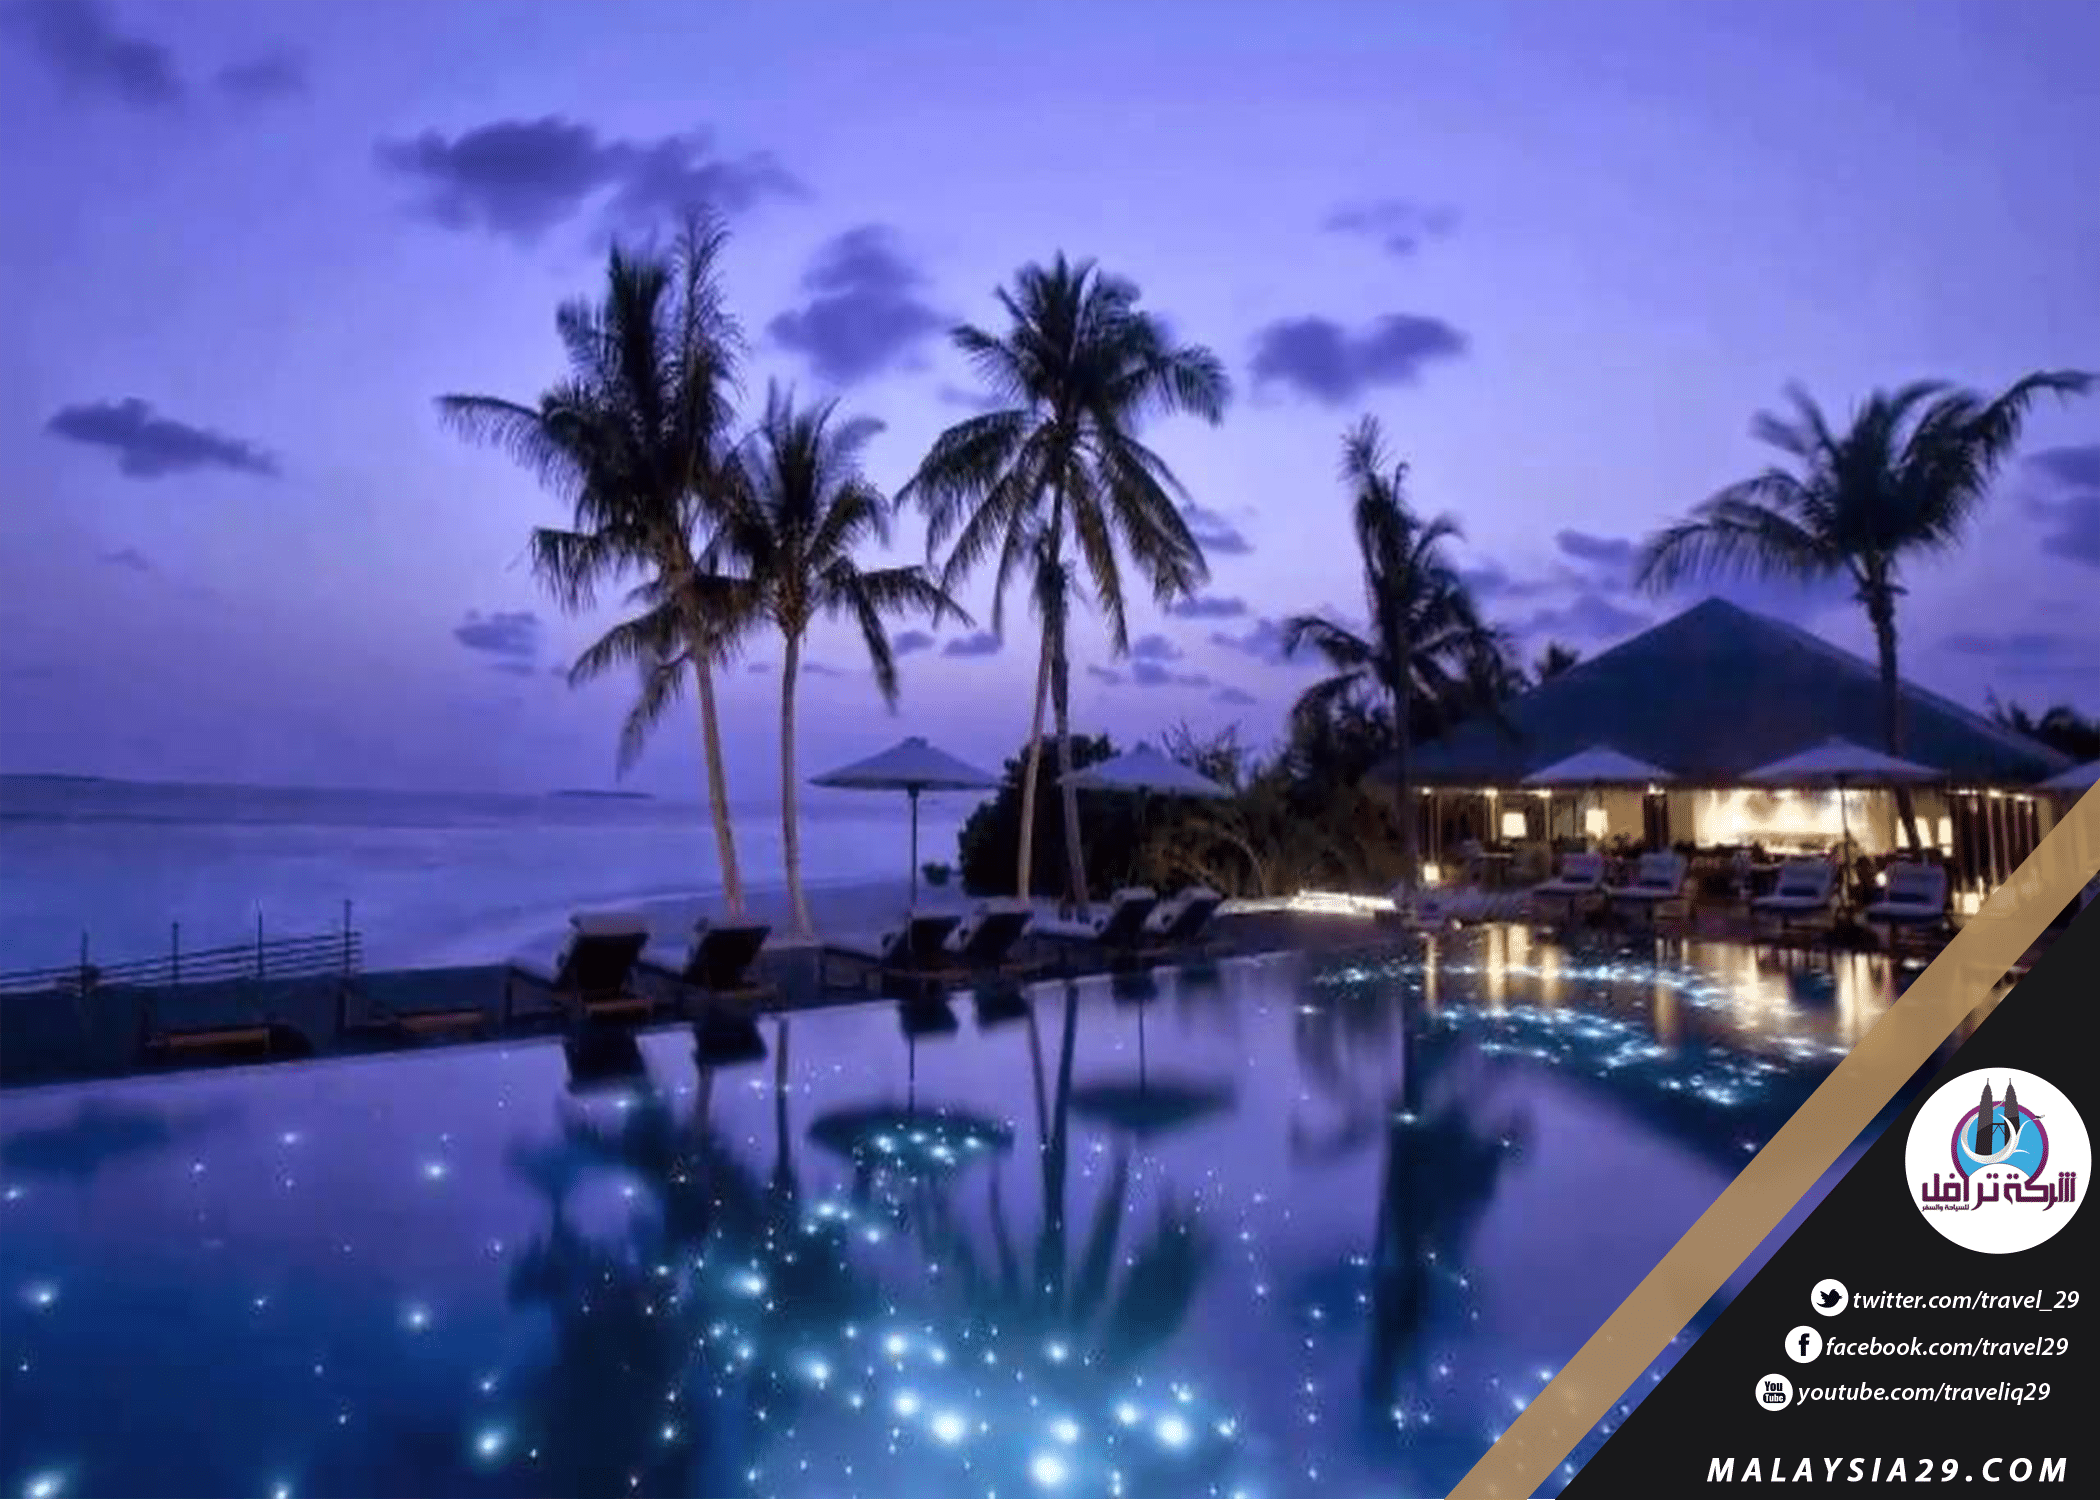 Best places in Mali Maldives 2018